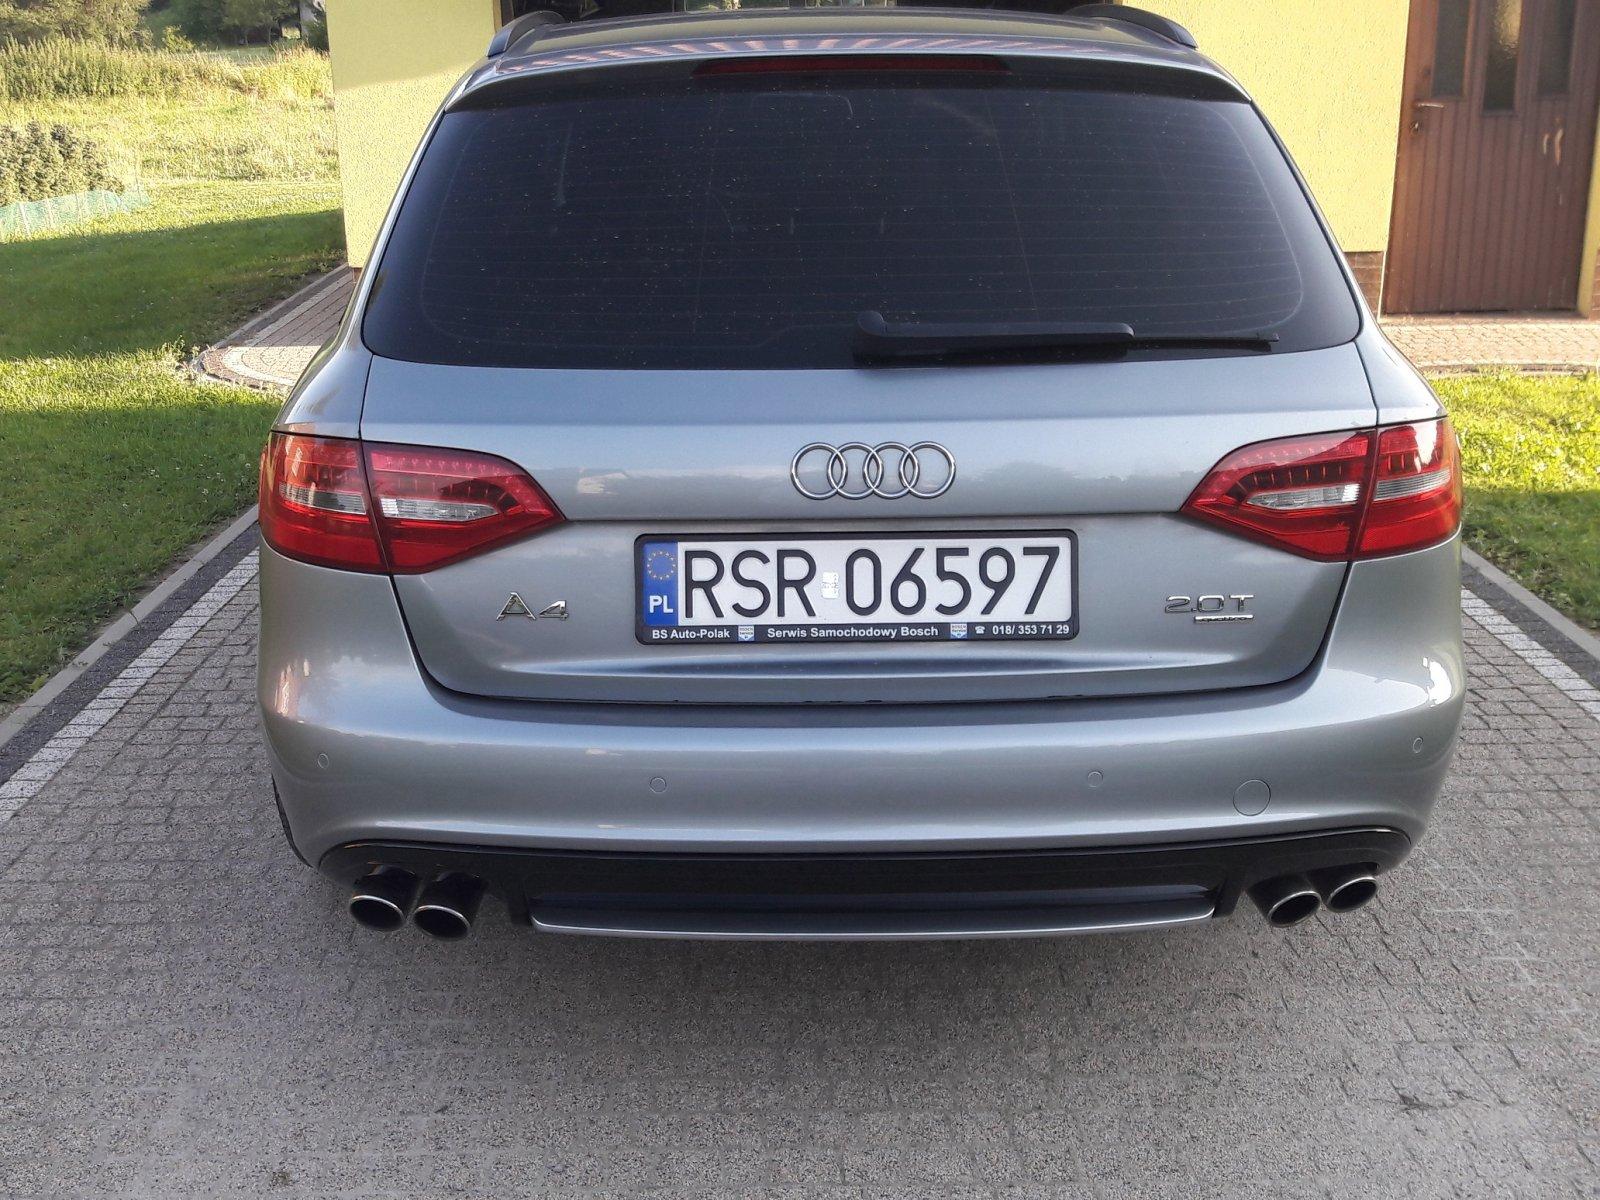 A4 b8 2 0tfsi a wydech od s4 Audi A4 B8 Audi A4 Klub Polska